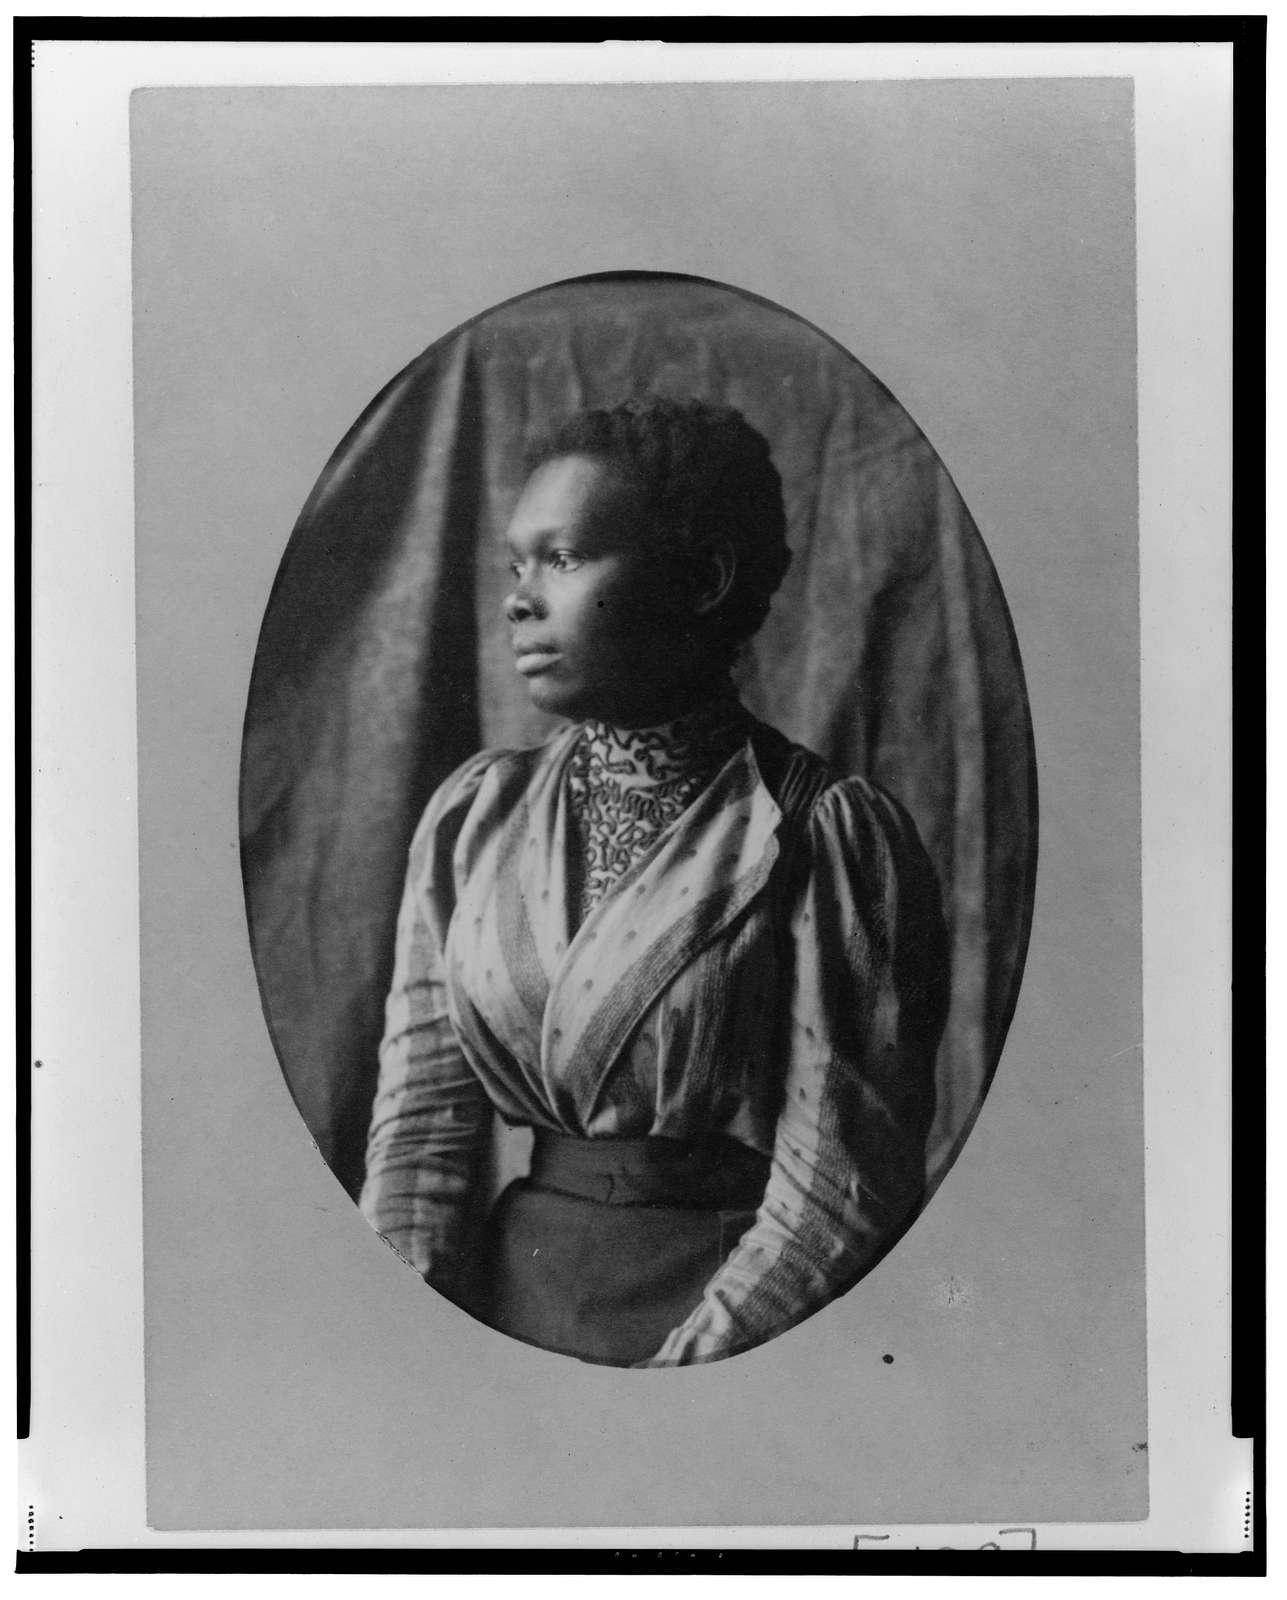 [African American woman, half-length portrait, left profile]